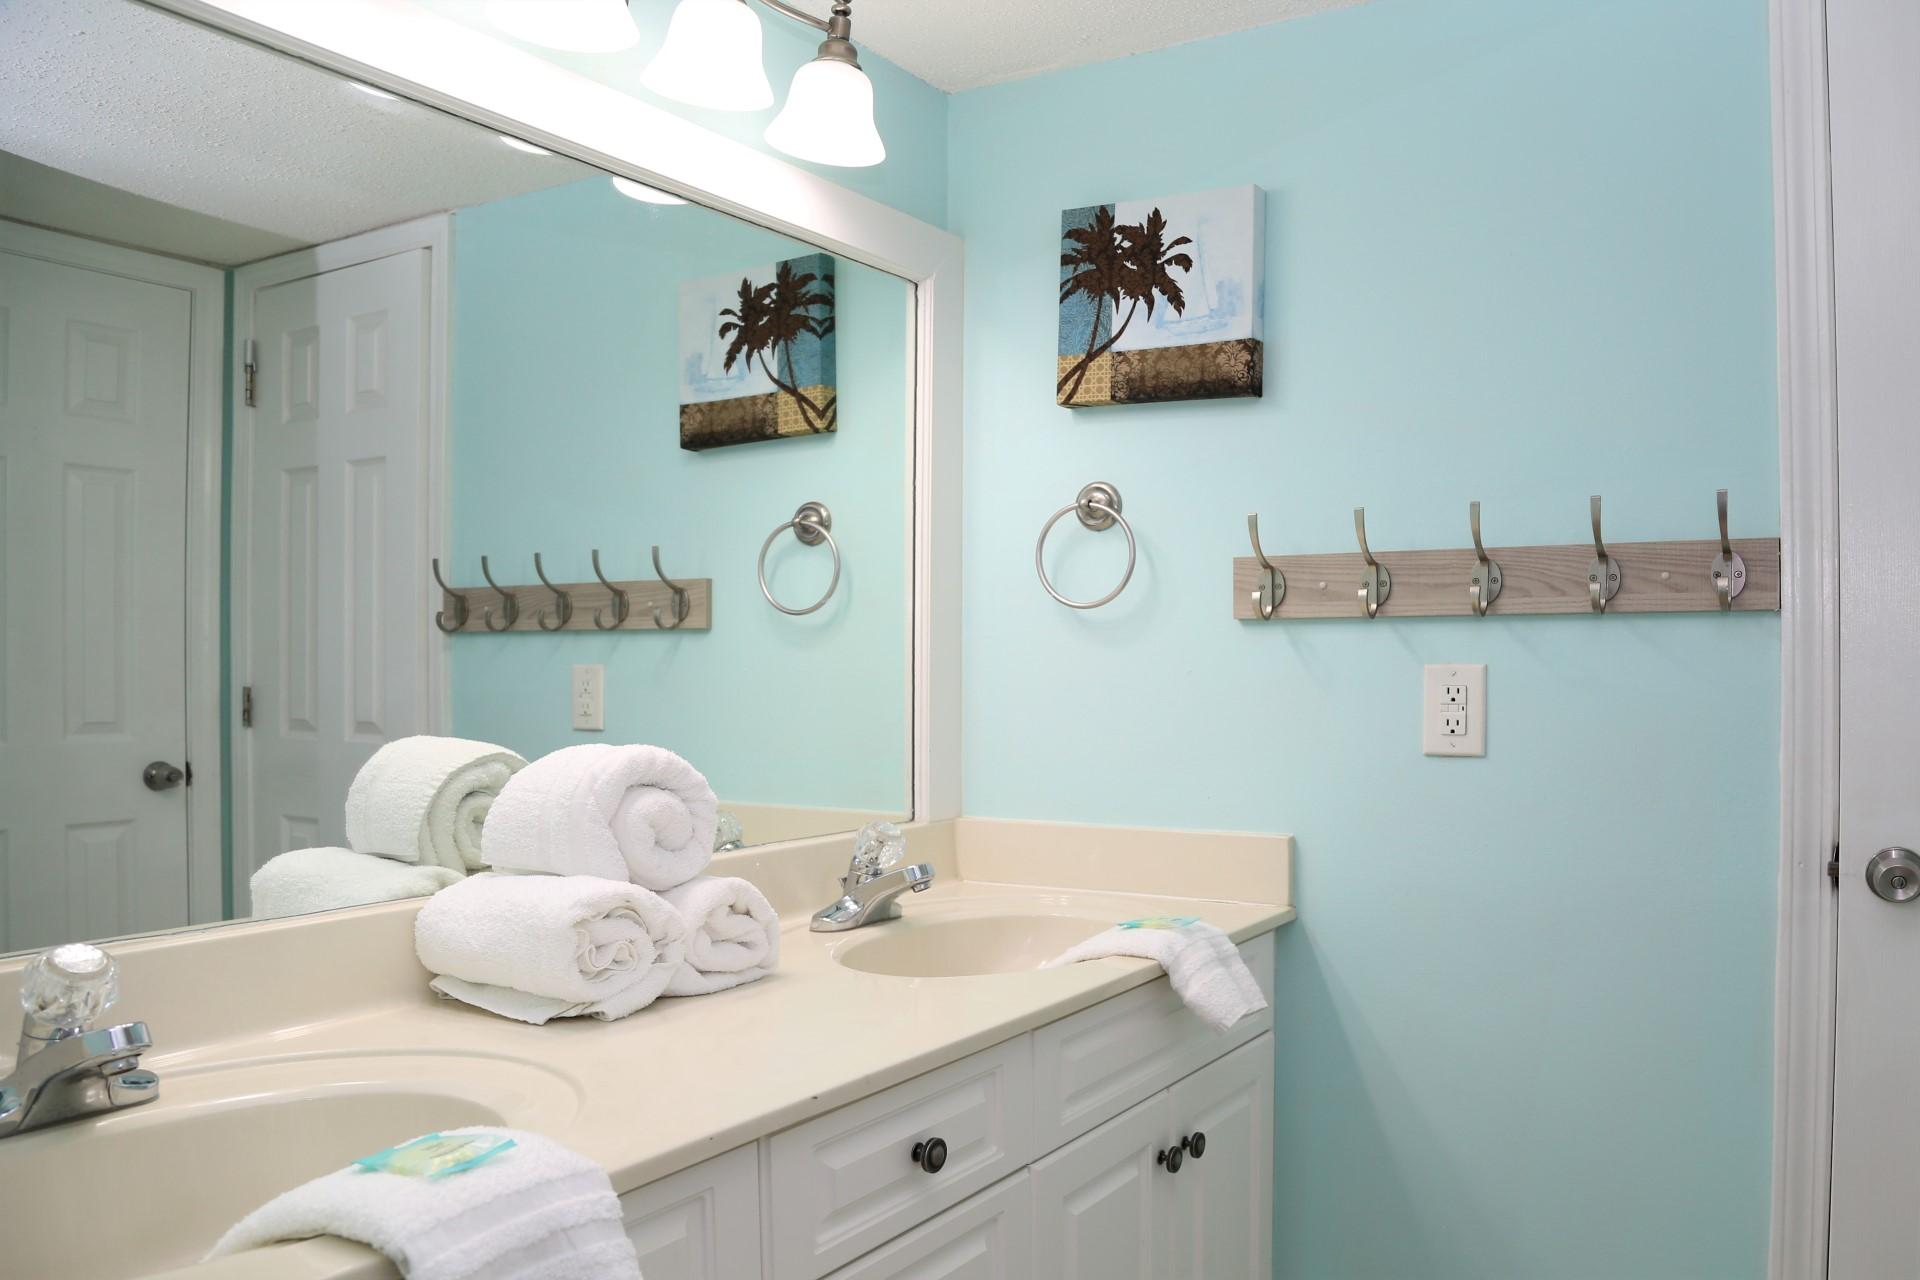 Castaways 1B - Second bathroom - Shower/tub combo